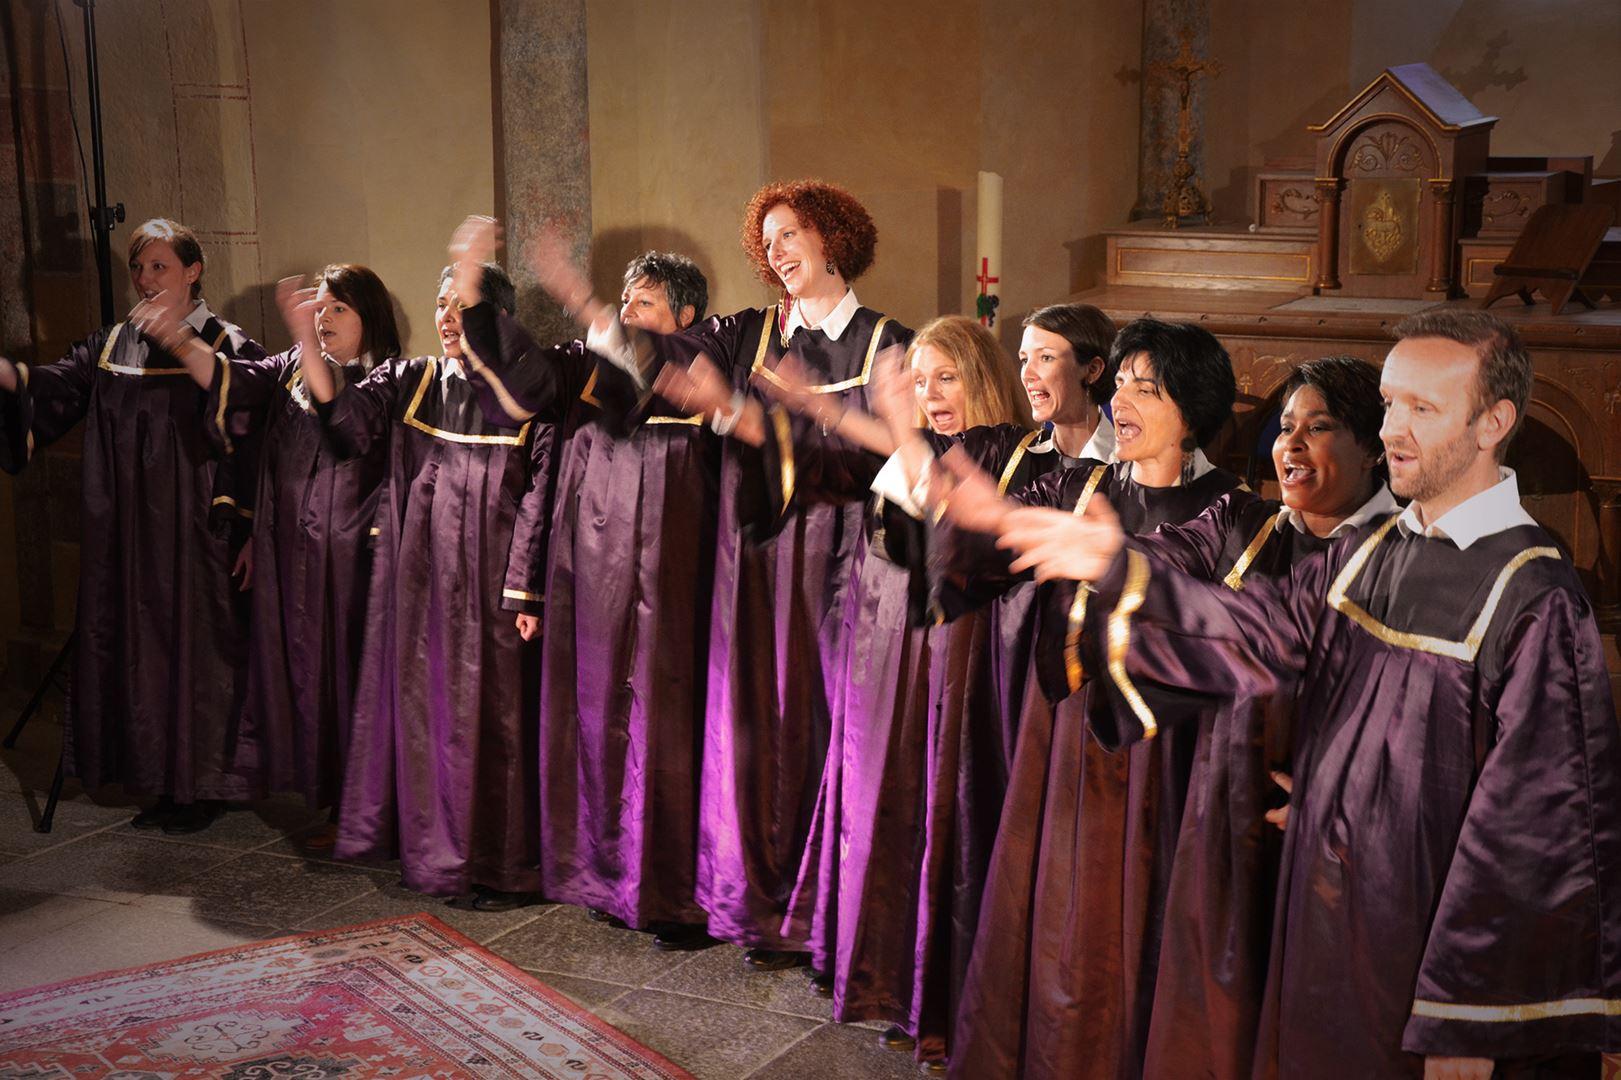 GOSPEL AMAZING SINGERS